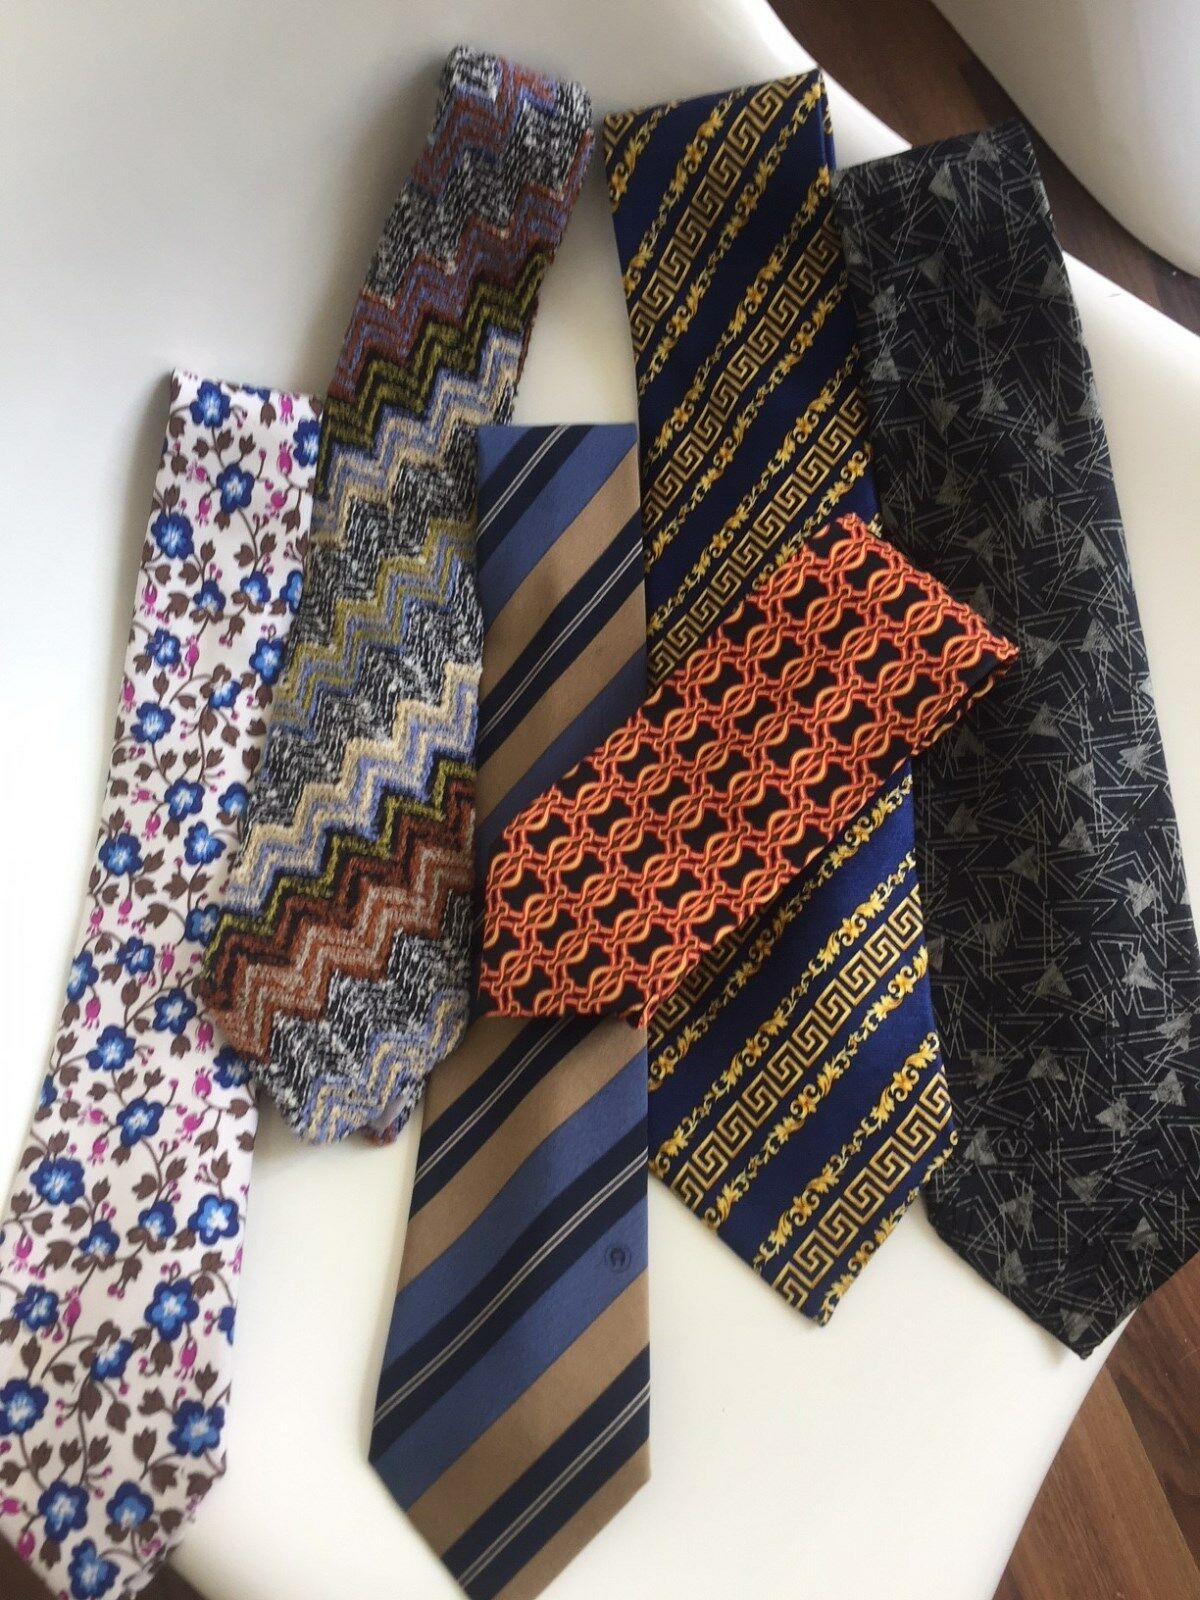 Bundle Tie Aigner Missoni Christian Dior Valentino Kenzo Versace Silk